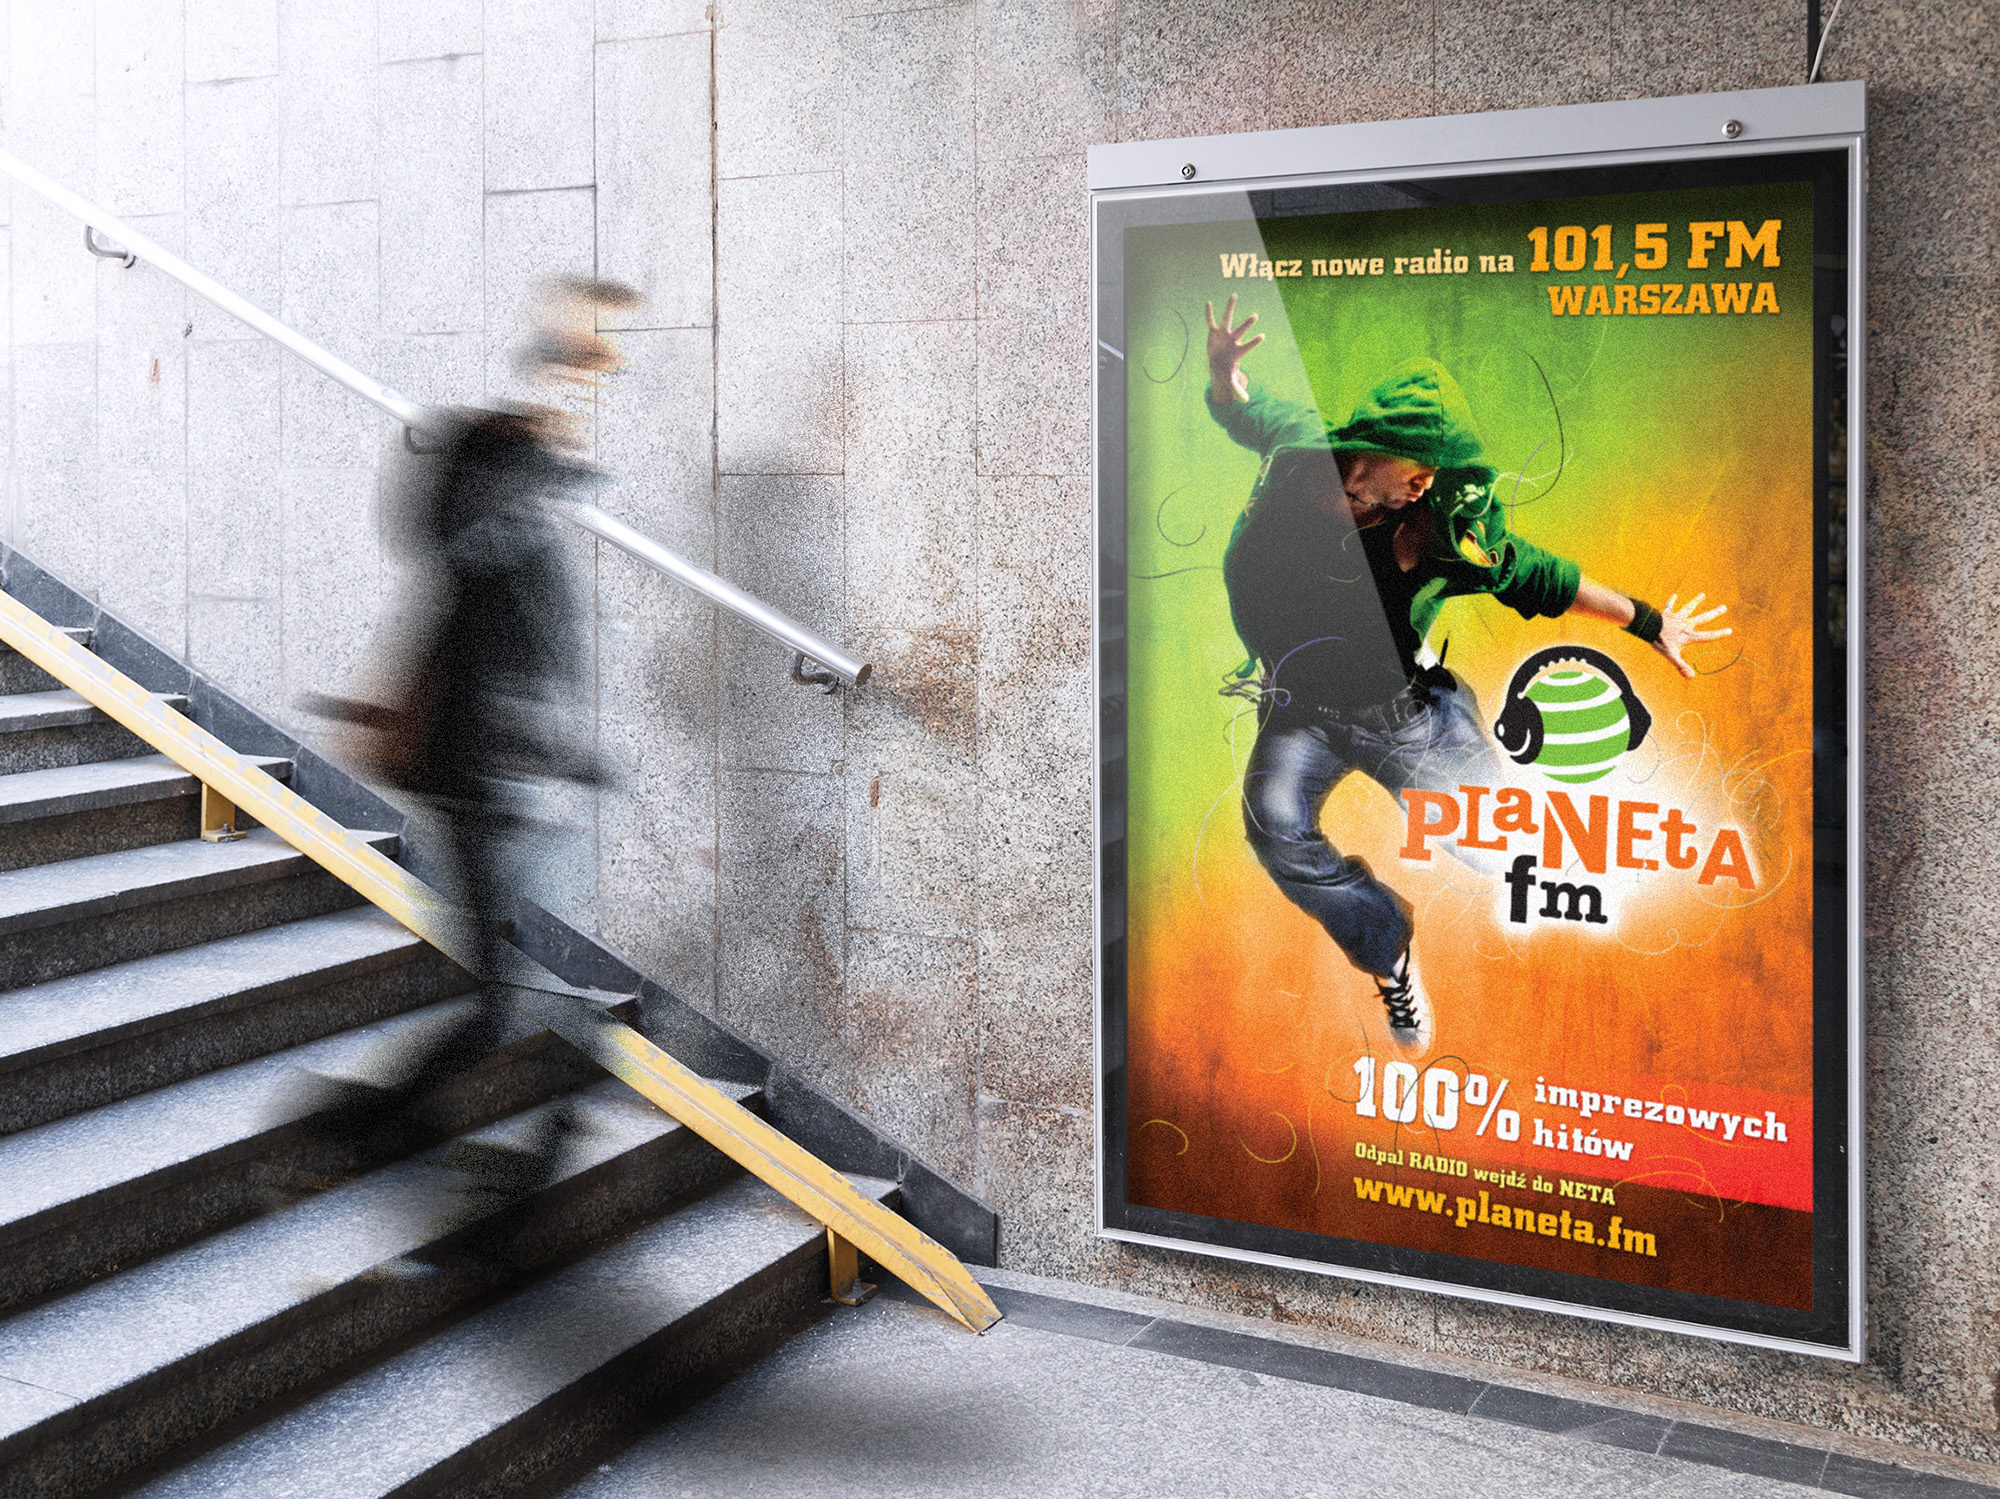 outdoor, plakat reklamowy planeta fm, projekty graficzne, design newspaper, ilustracja, concept art, key visual, art designer Ireneusz Bloch